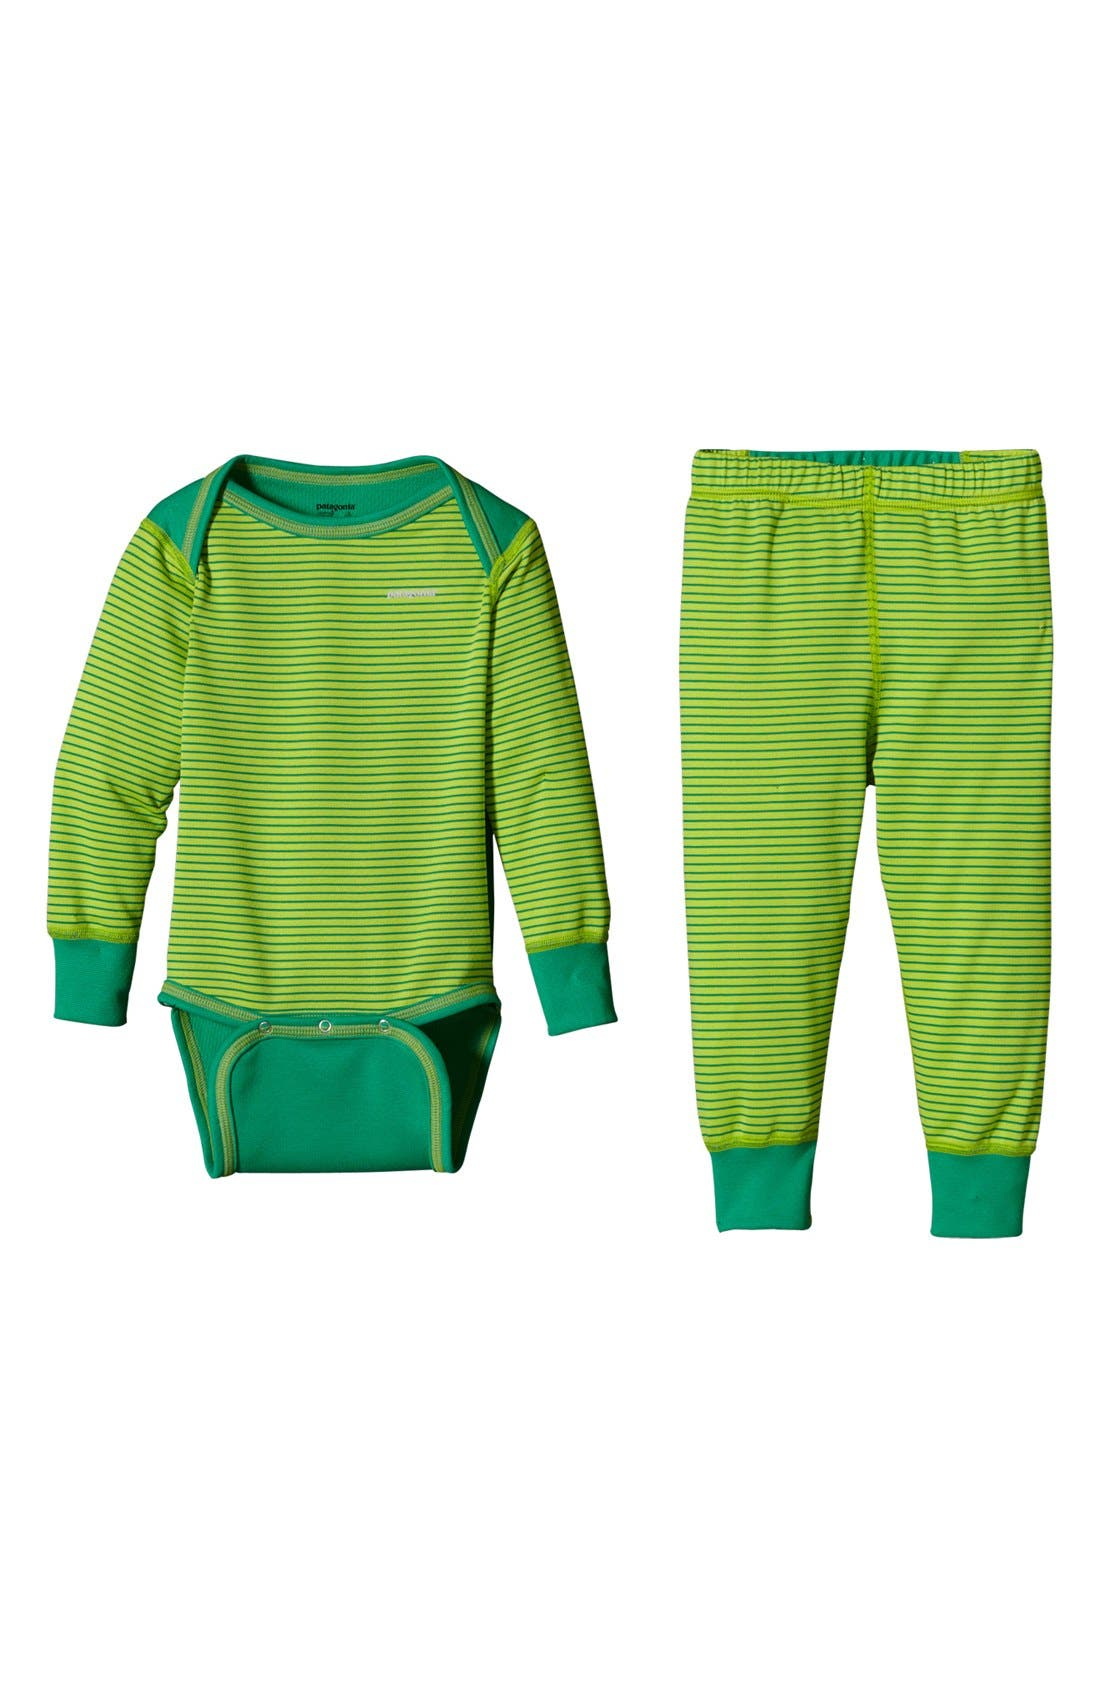 Alternate Image 1 Selected - Patagonia 'Capilene® 3' Bodysuit & Pants (Toddler)